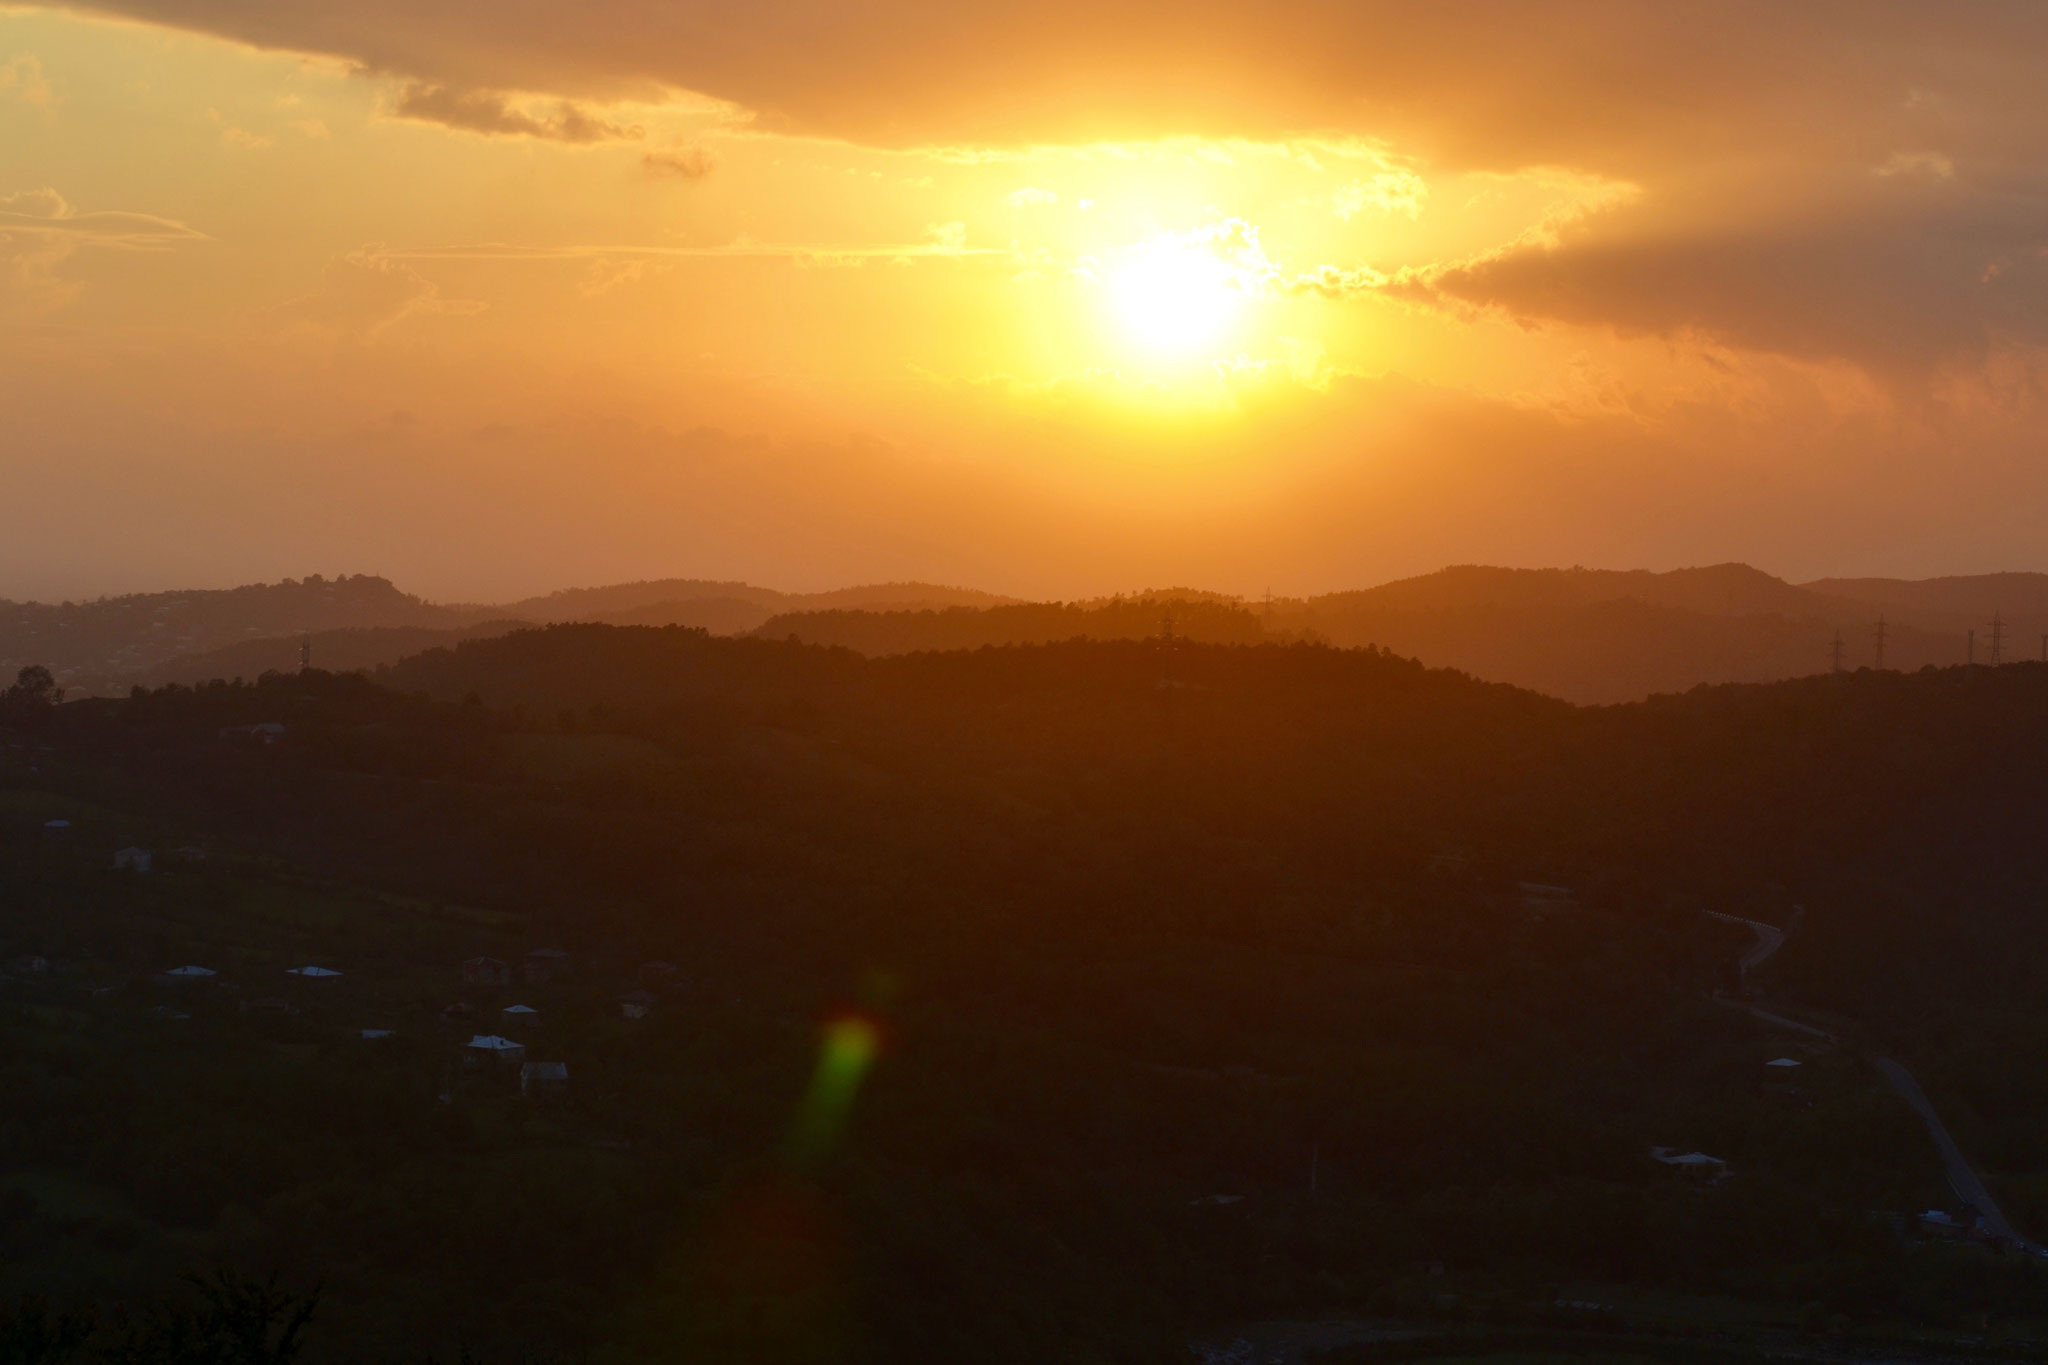 Sonnenuntergang vor dem UNESCO-Weltkulturerbe Kloster Gelati